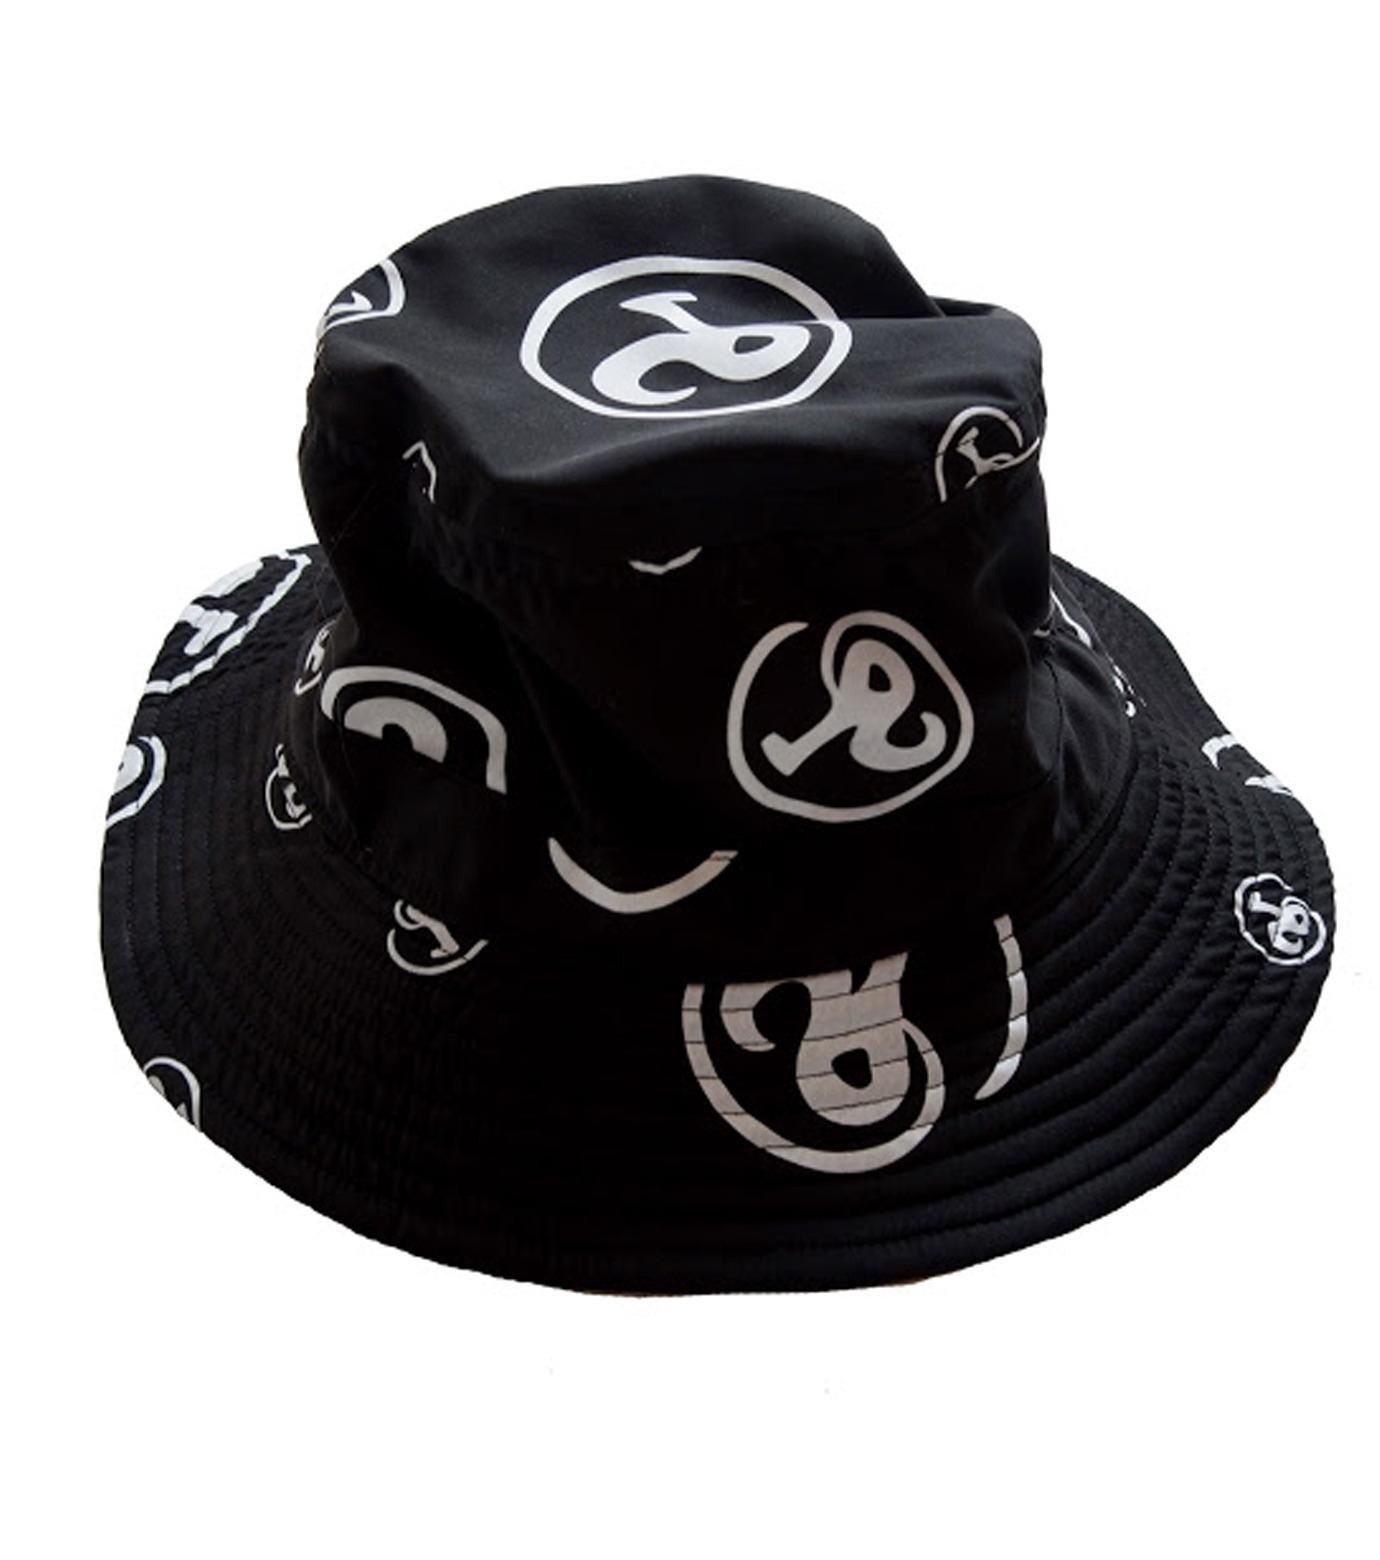 Richardson Magazine(リチャードソン マガジン)のErika Bucket Hat-BLACK(キャップ/cap)-RM-ErikaHat-13 拡大詳細画像1